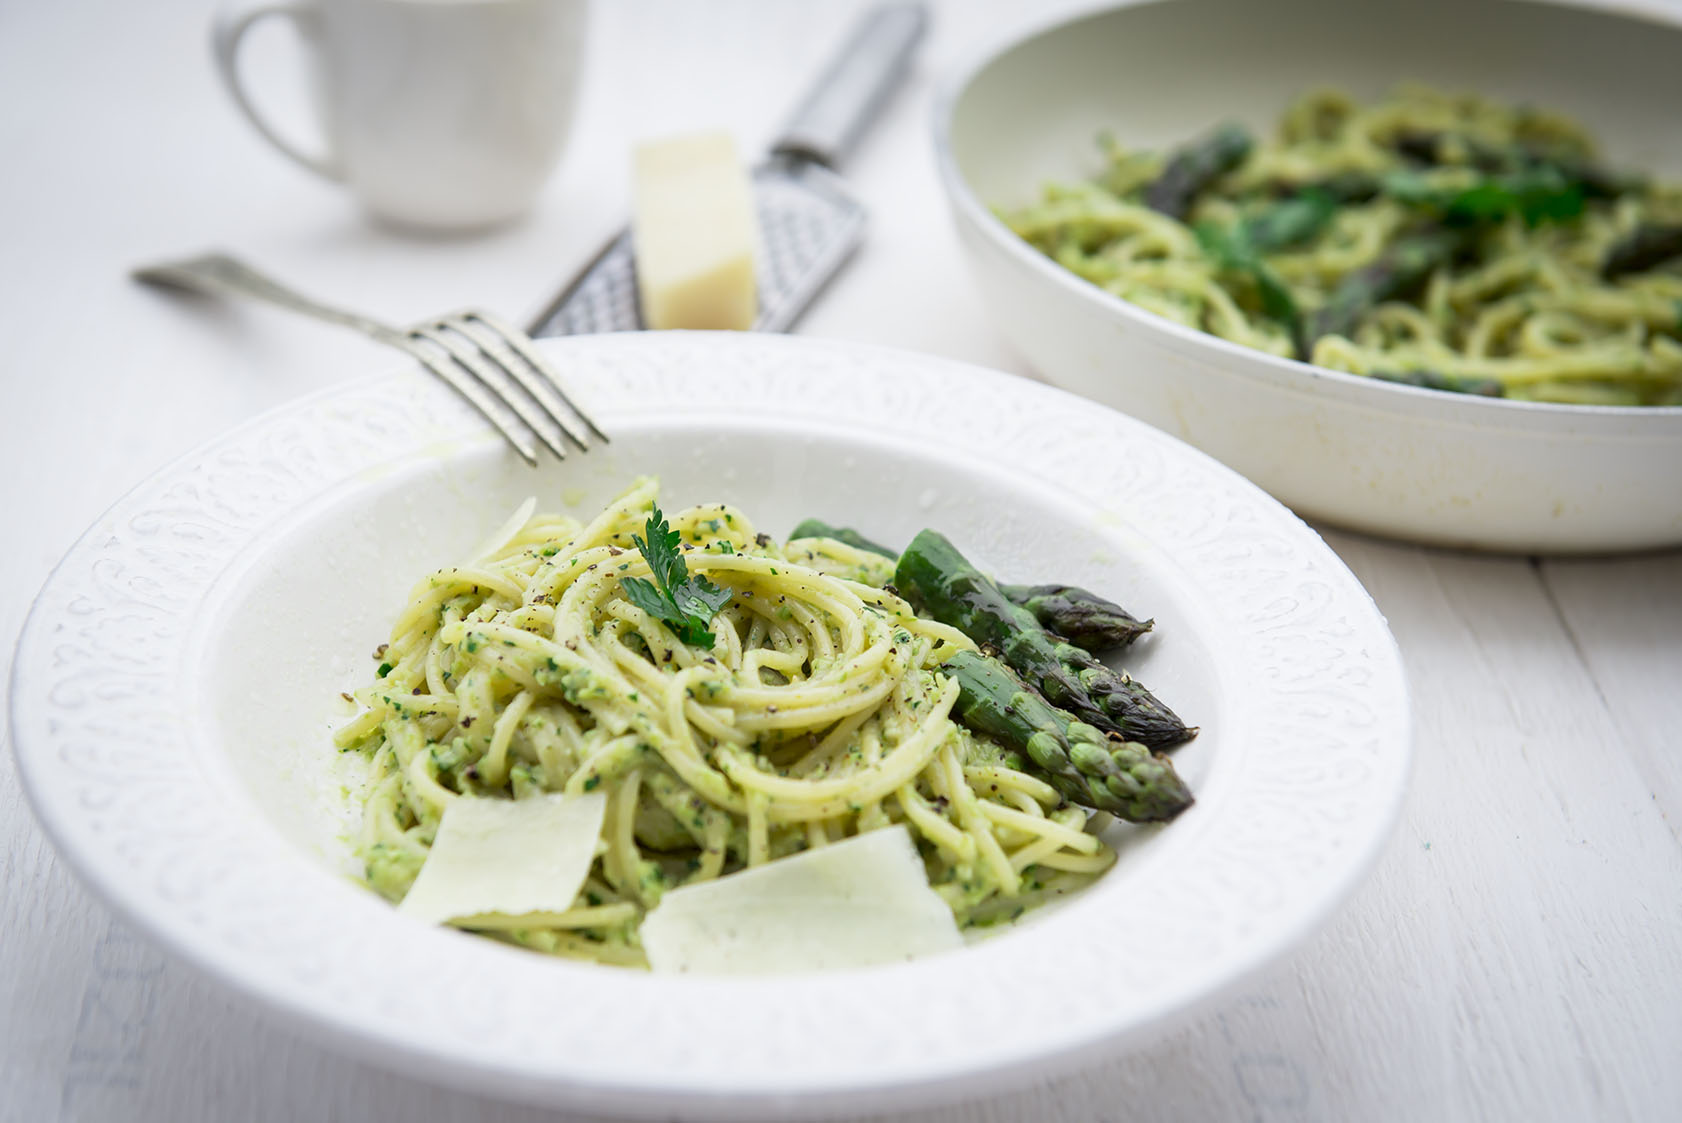 AGN_ szparagi, spaghetti106